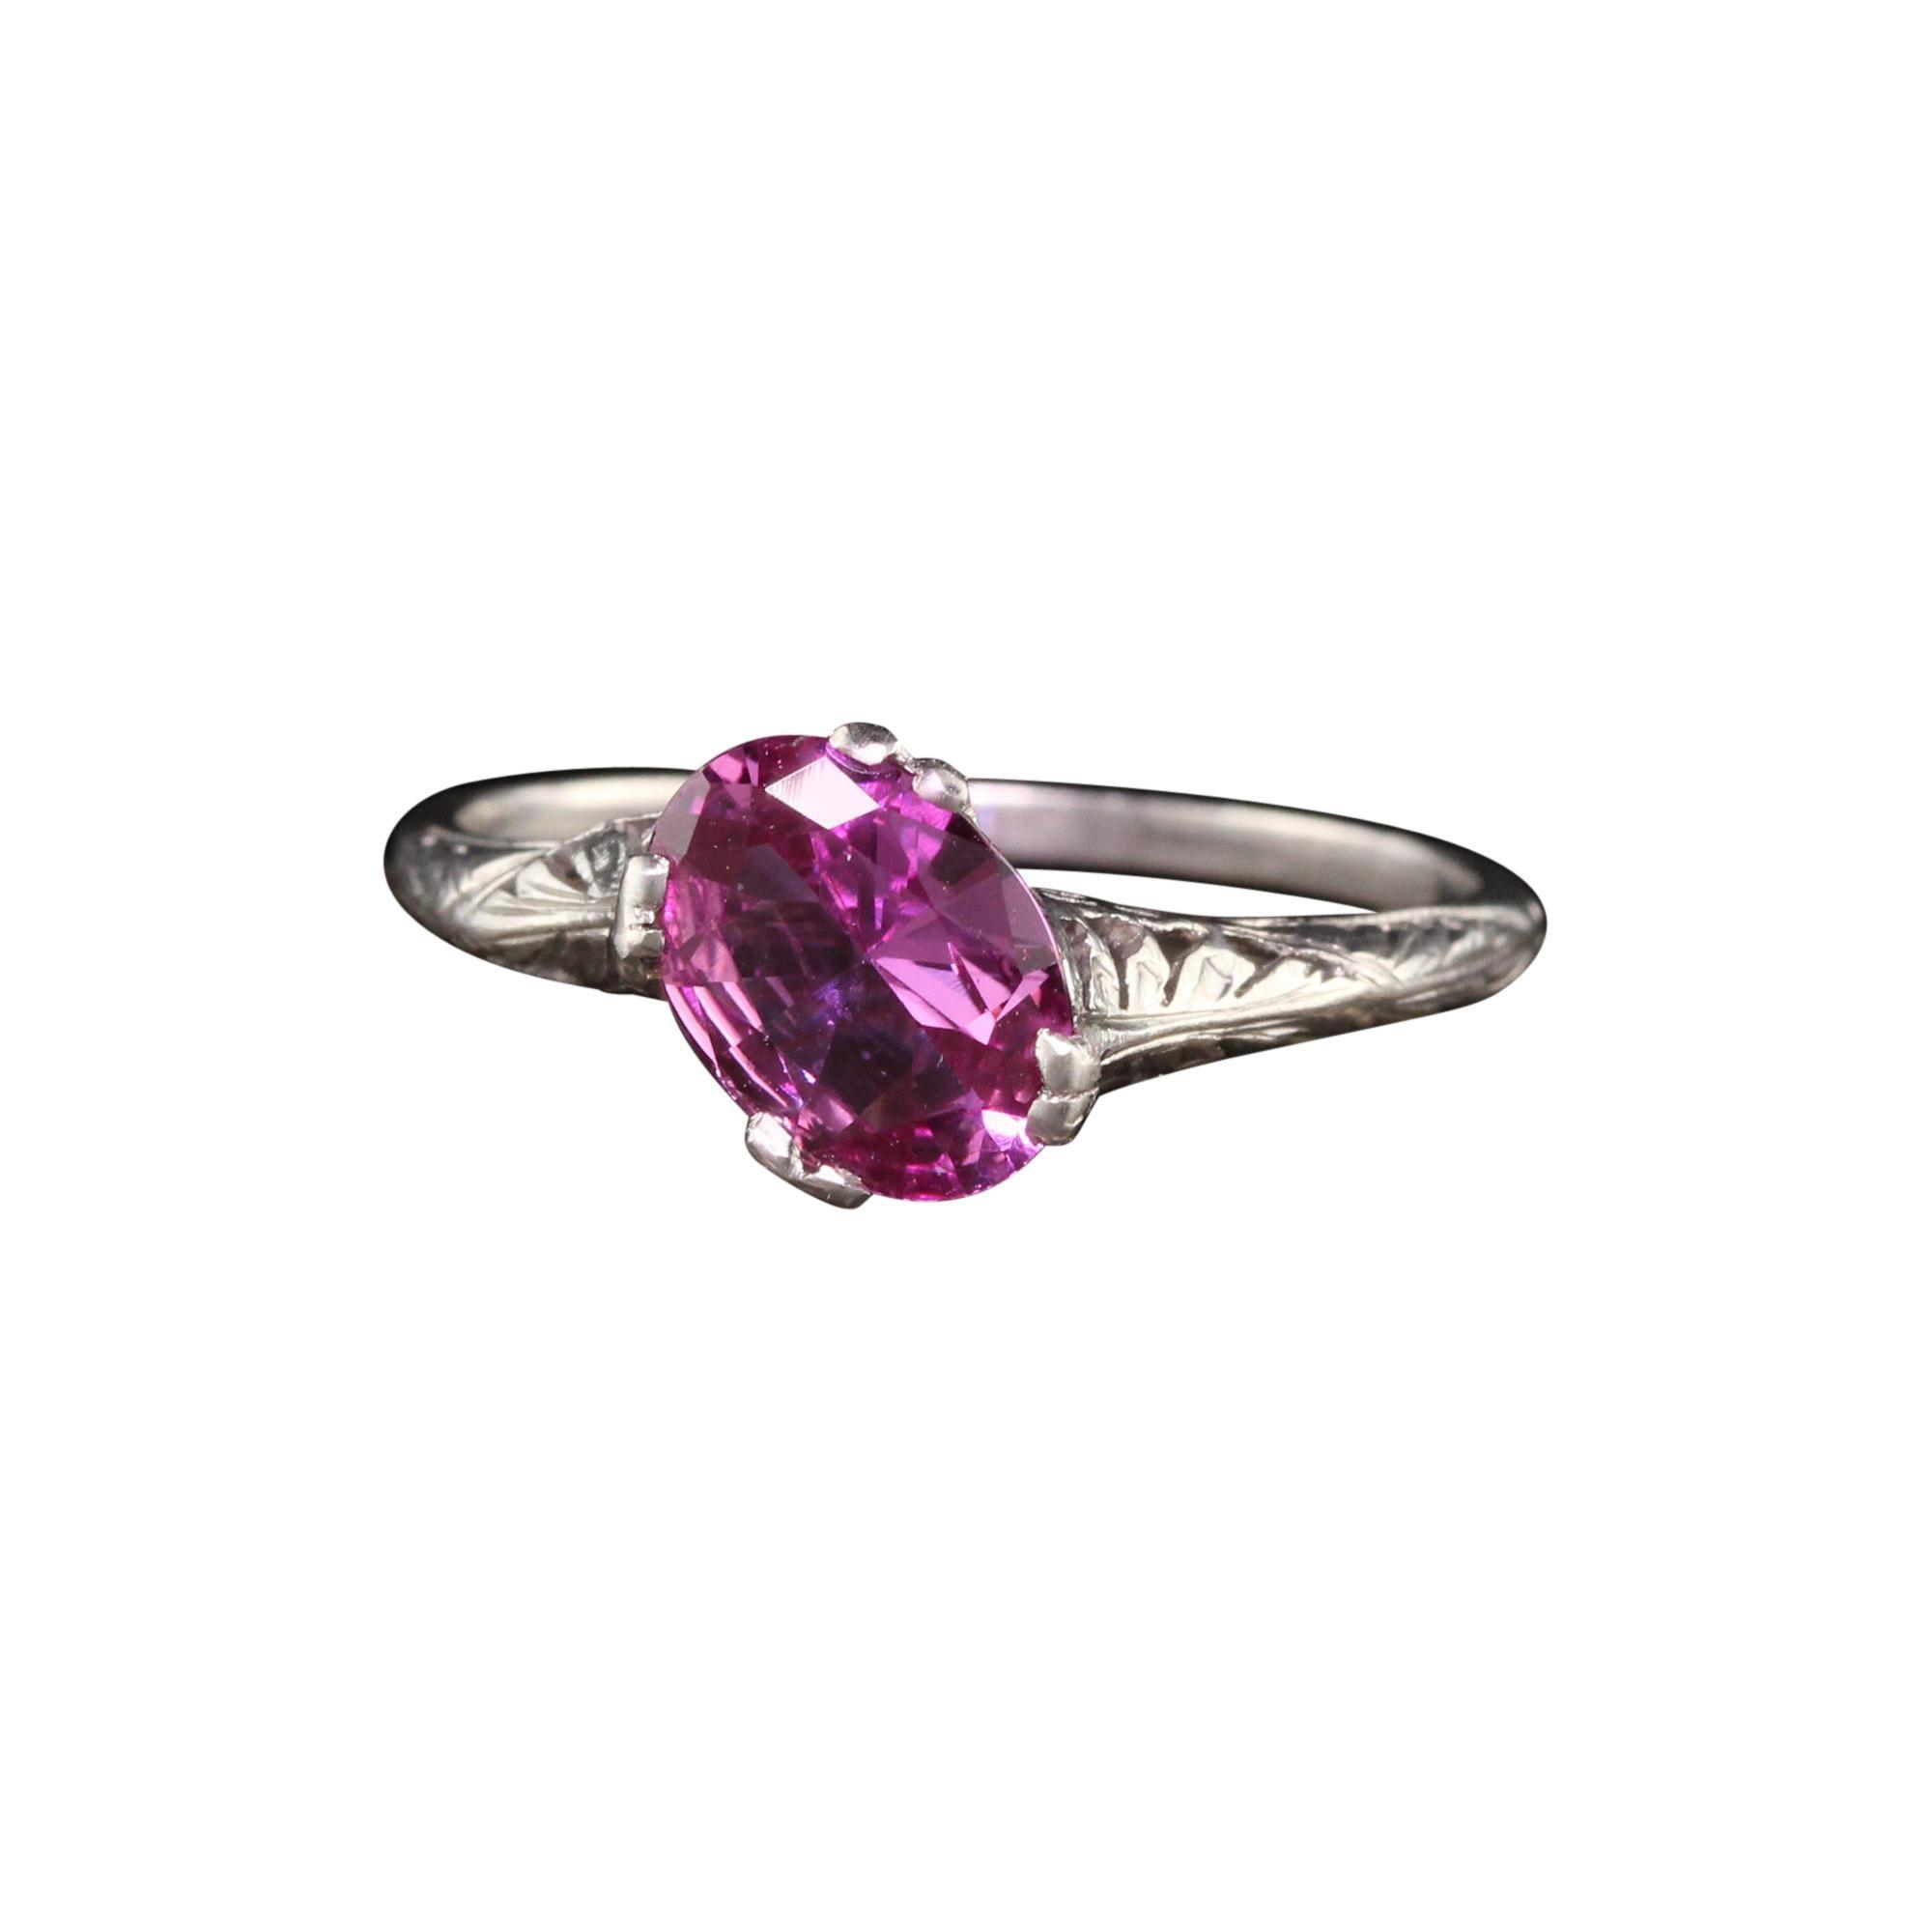 Antique Art Deco Platinum Oval Pink Sapphire Filigree Engagement Ring